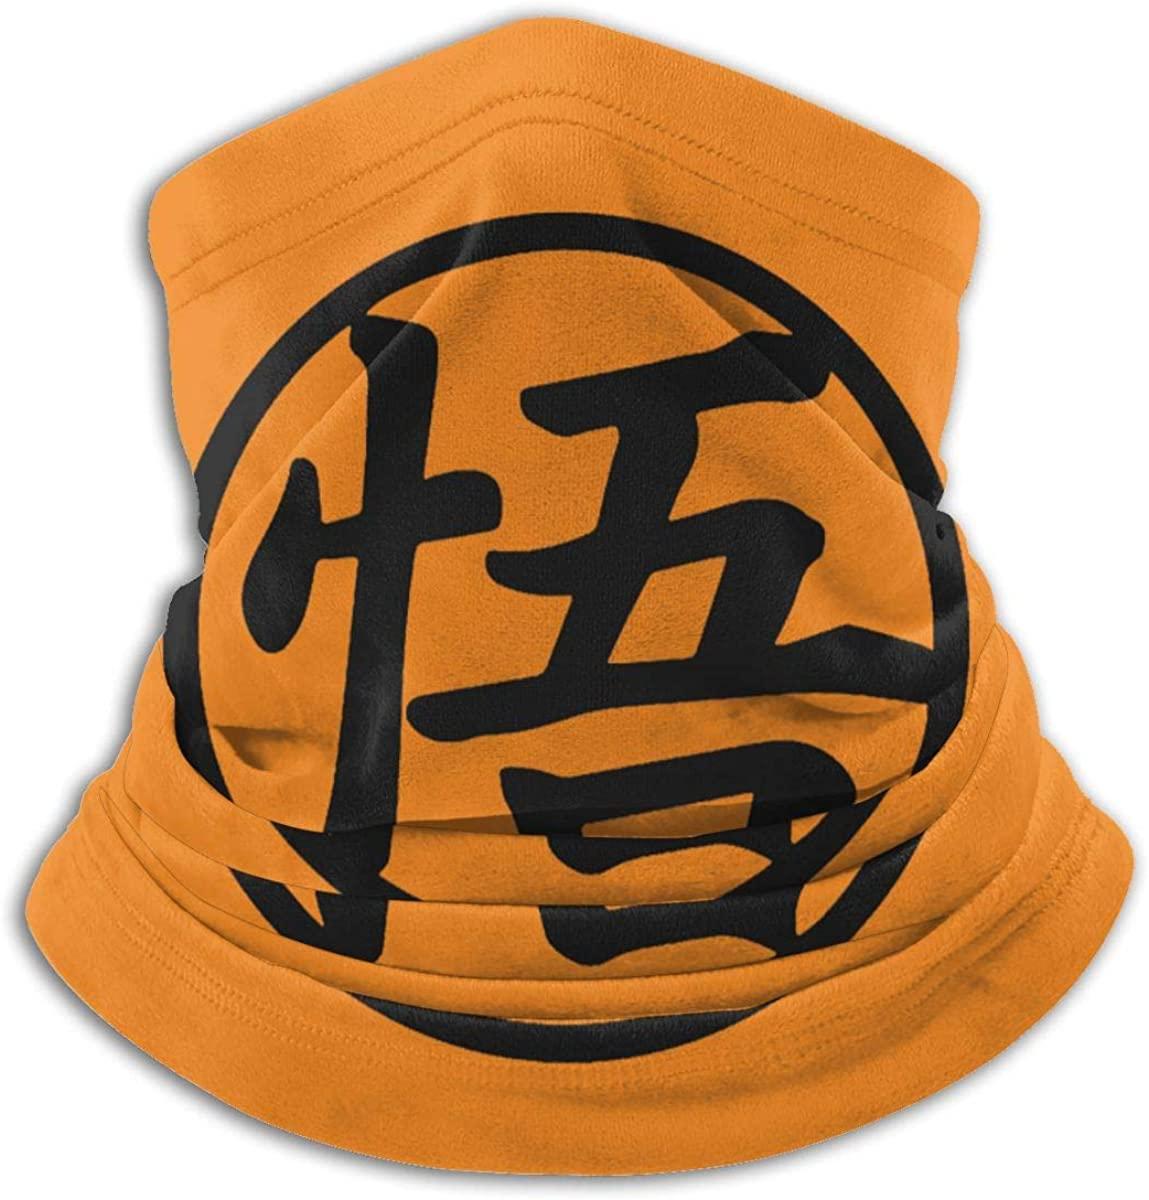 Dragon Ball Fleece Neck Warmer - Windproof Winter Neck Gaiter Cold Weather Face Mask For Men Women